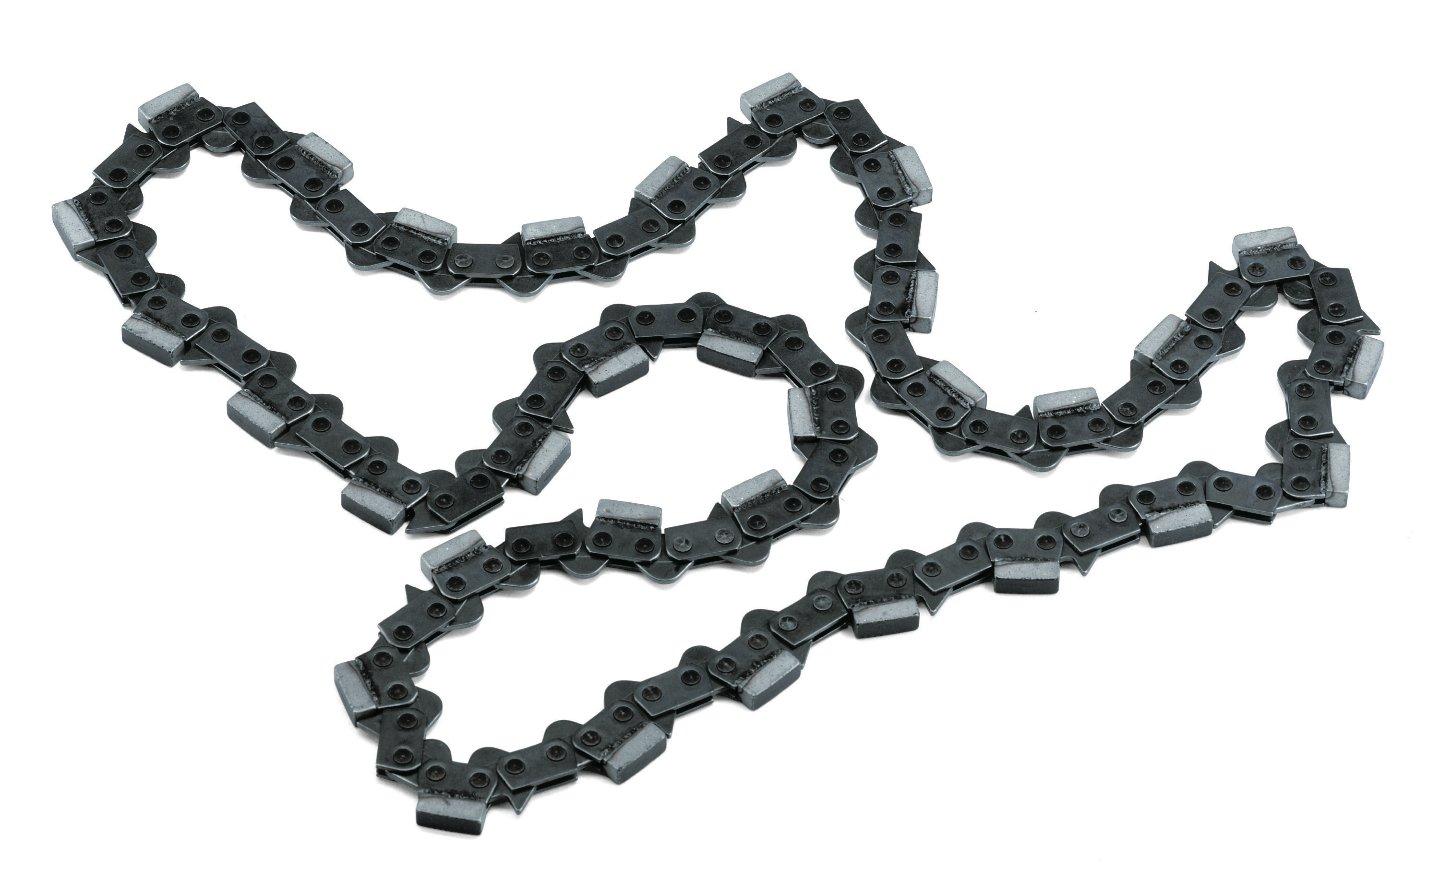 Husqvarna Construction Products 531101184 Diamond Chain SLC45 by Husqvarna